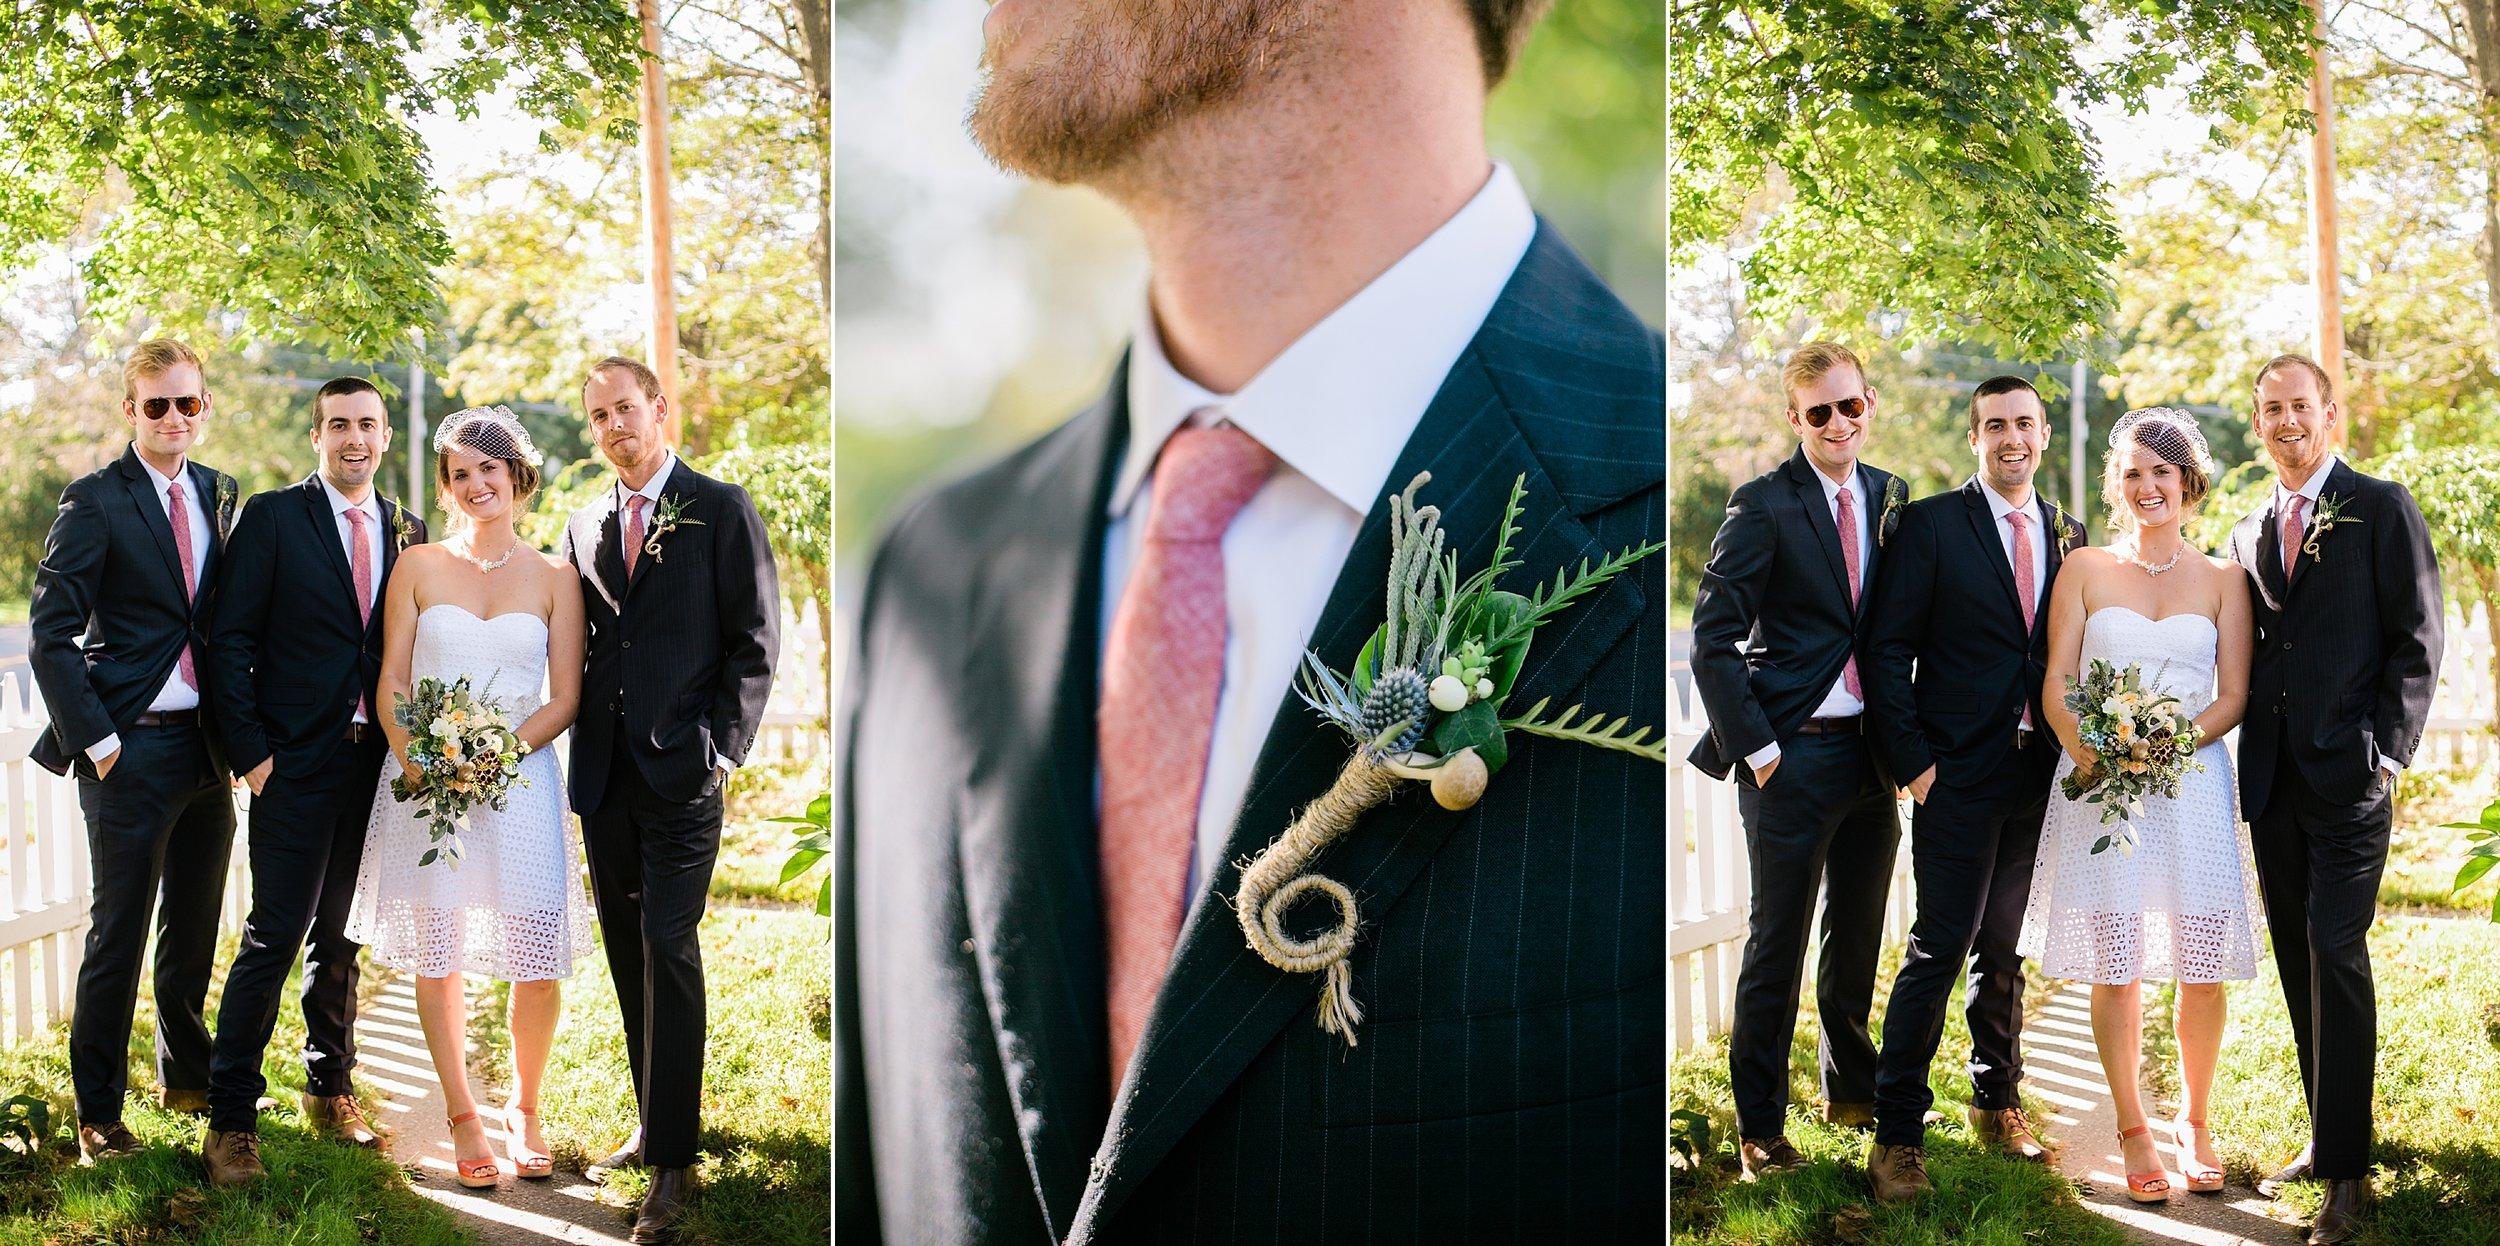 009 los angeles wedding photographer.jpg